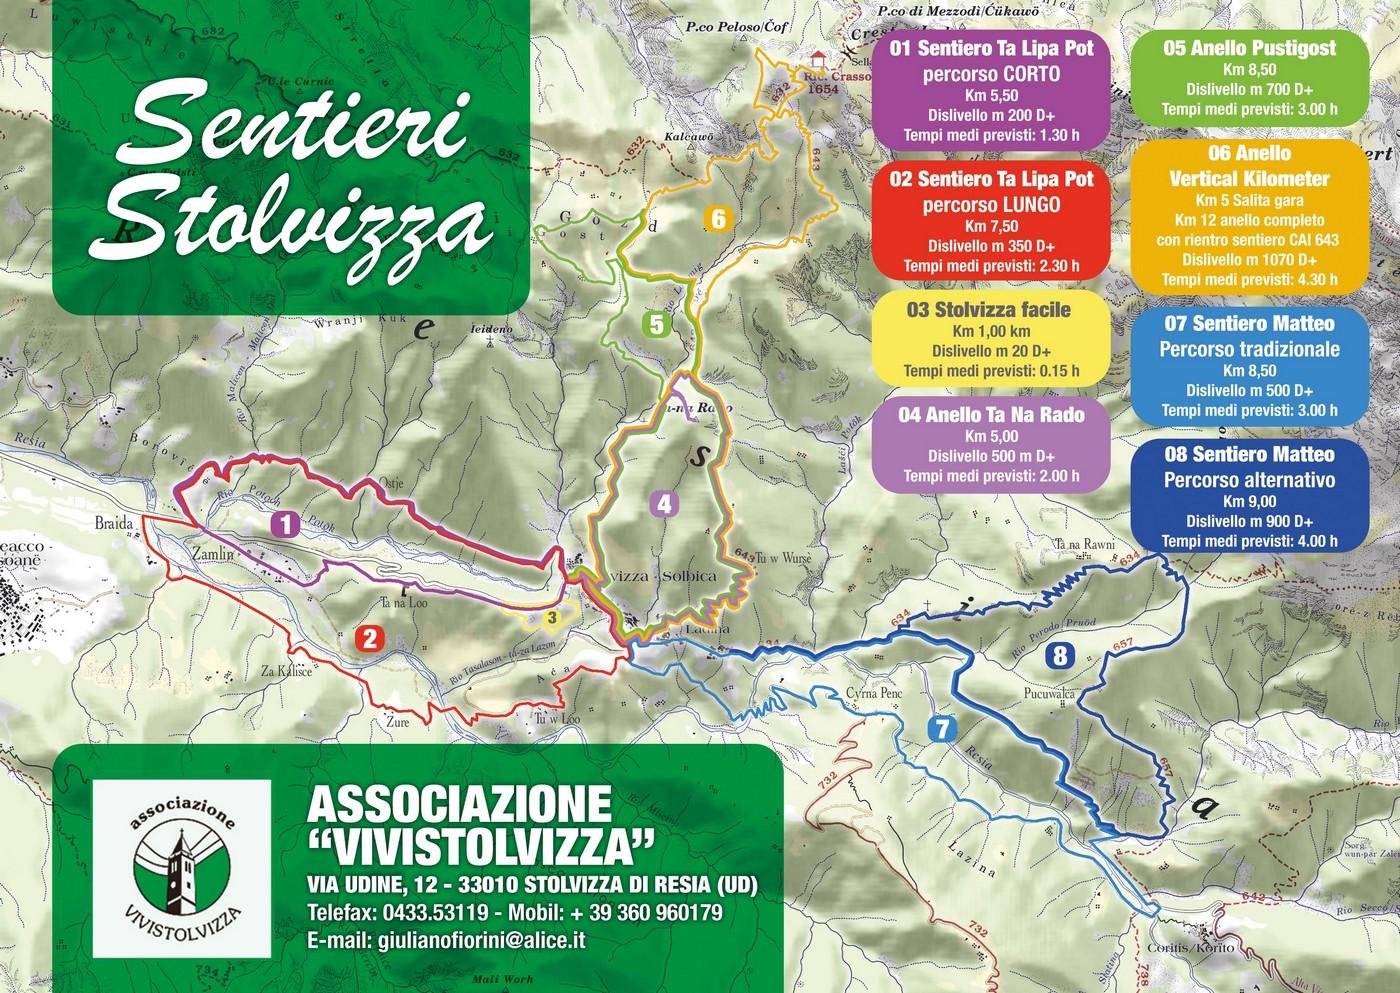 Cartina Slovenia Pdf.Download Mi Smo Tu Istituto Per La Cultura Slovena Institut Za Slovensko Kulturo